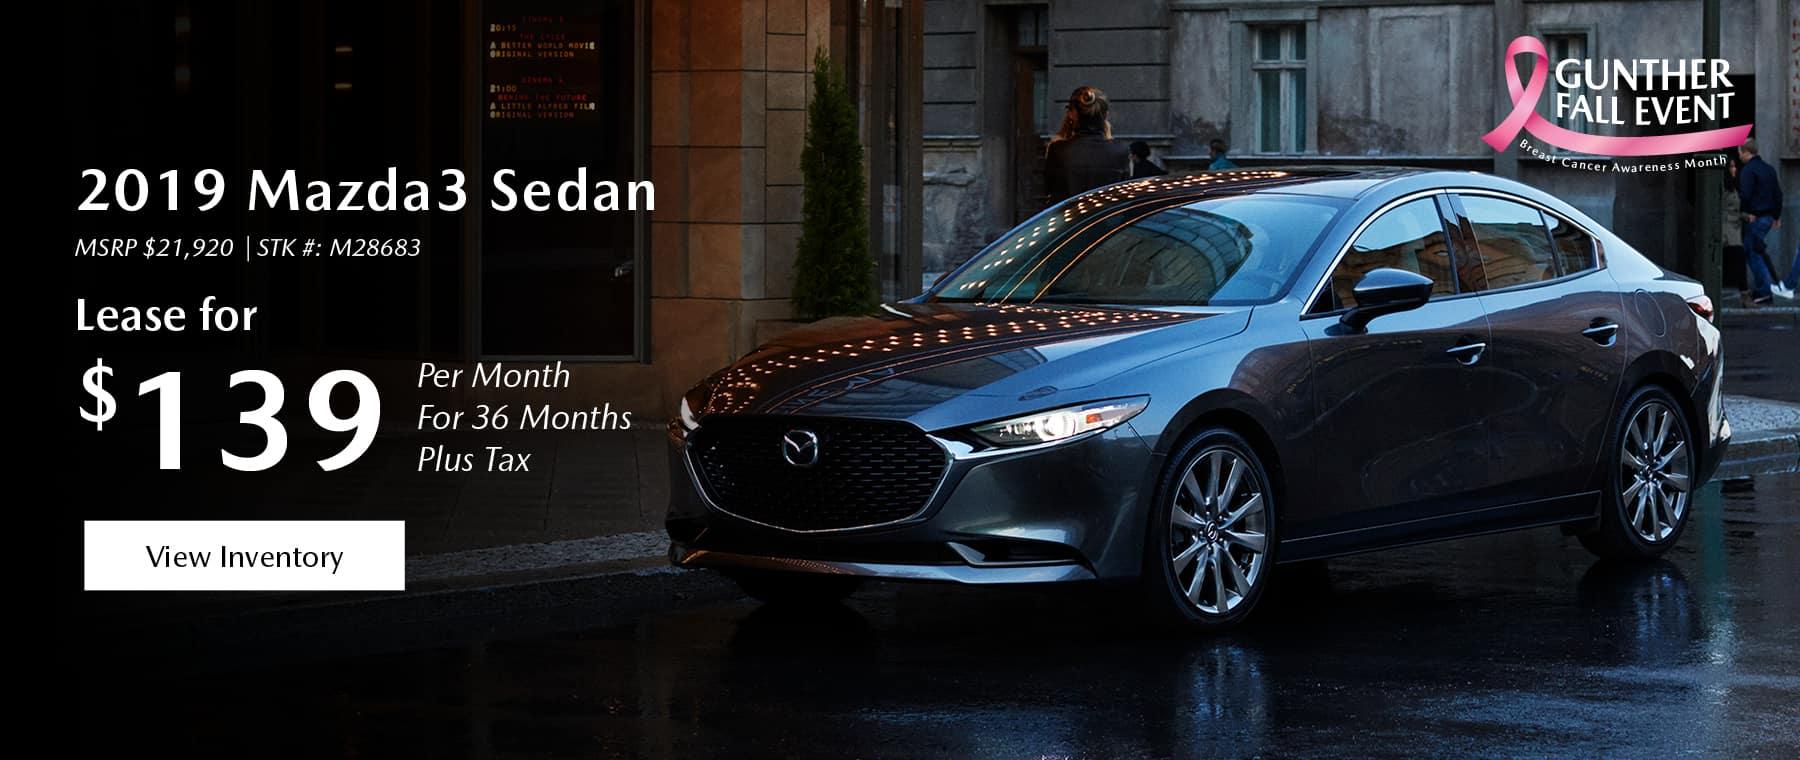 Lease the 2019 Mazda3 sedan for $139 per month, plus tax.